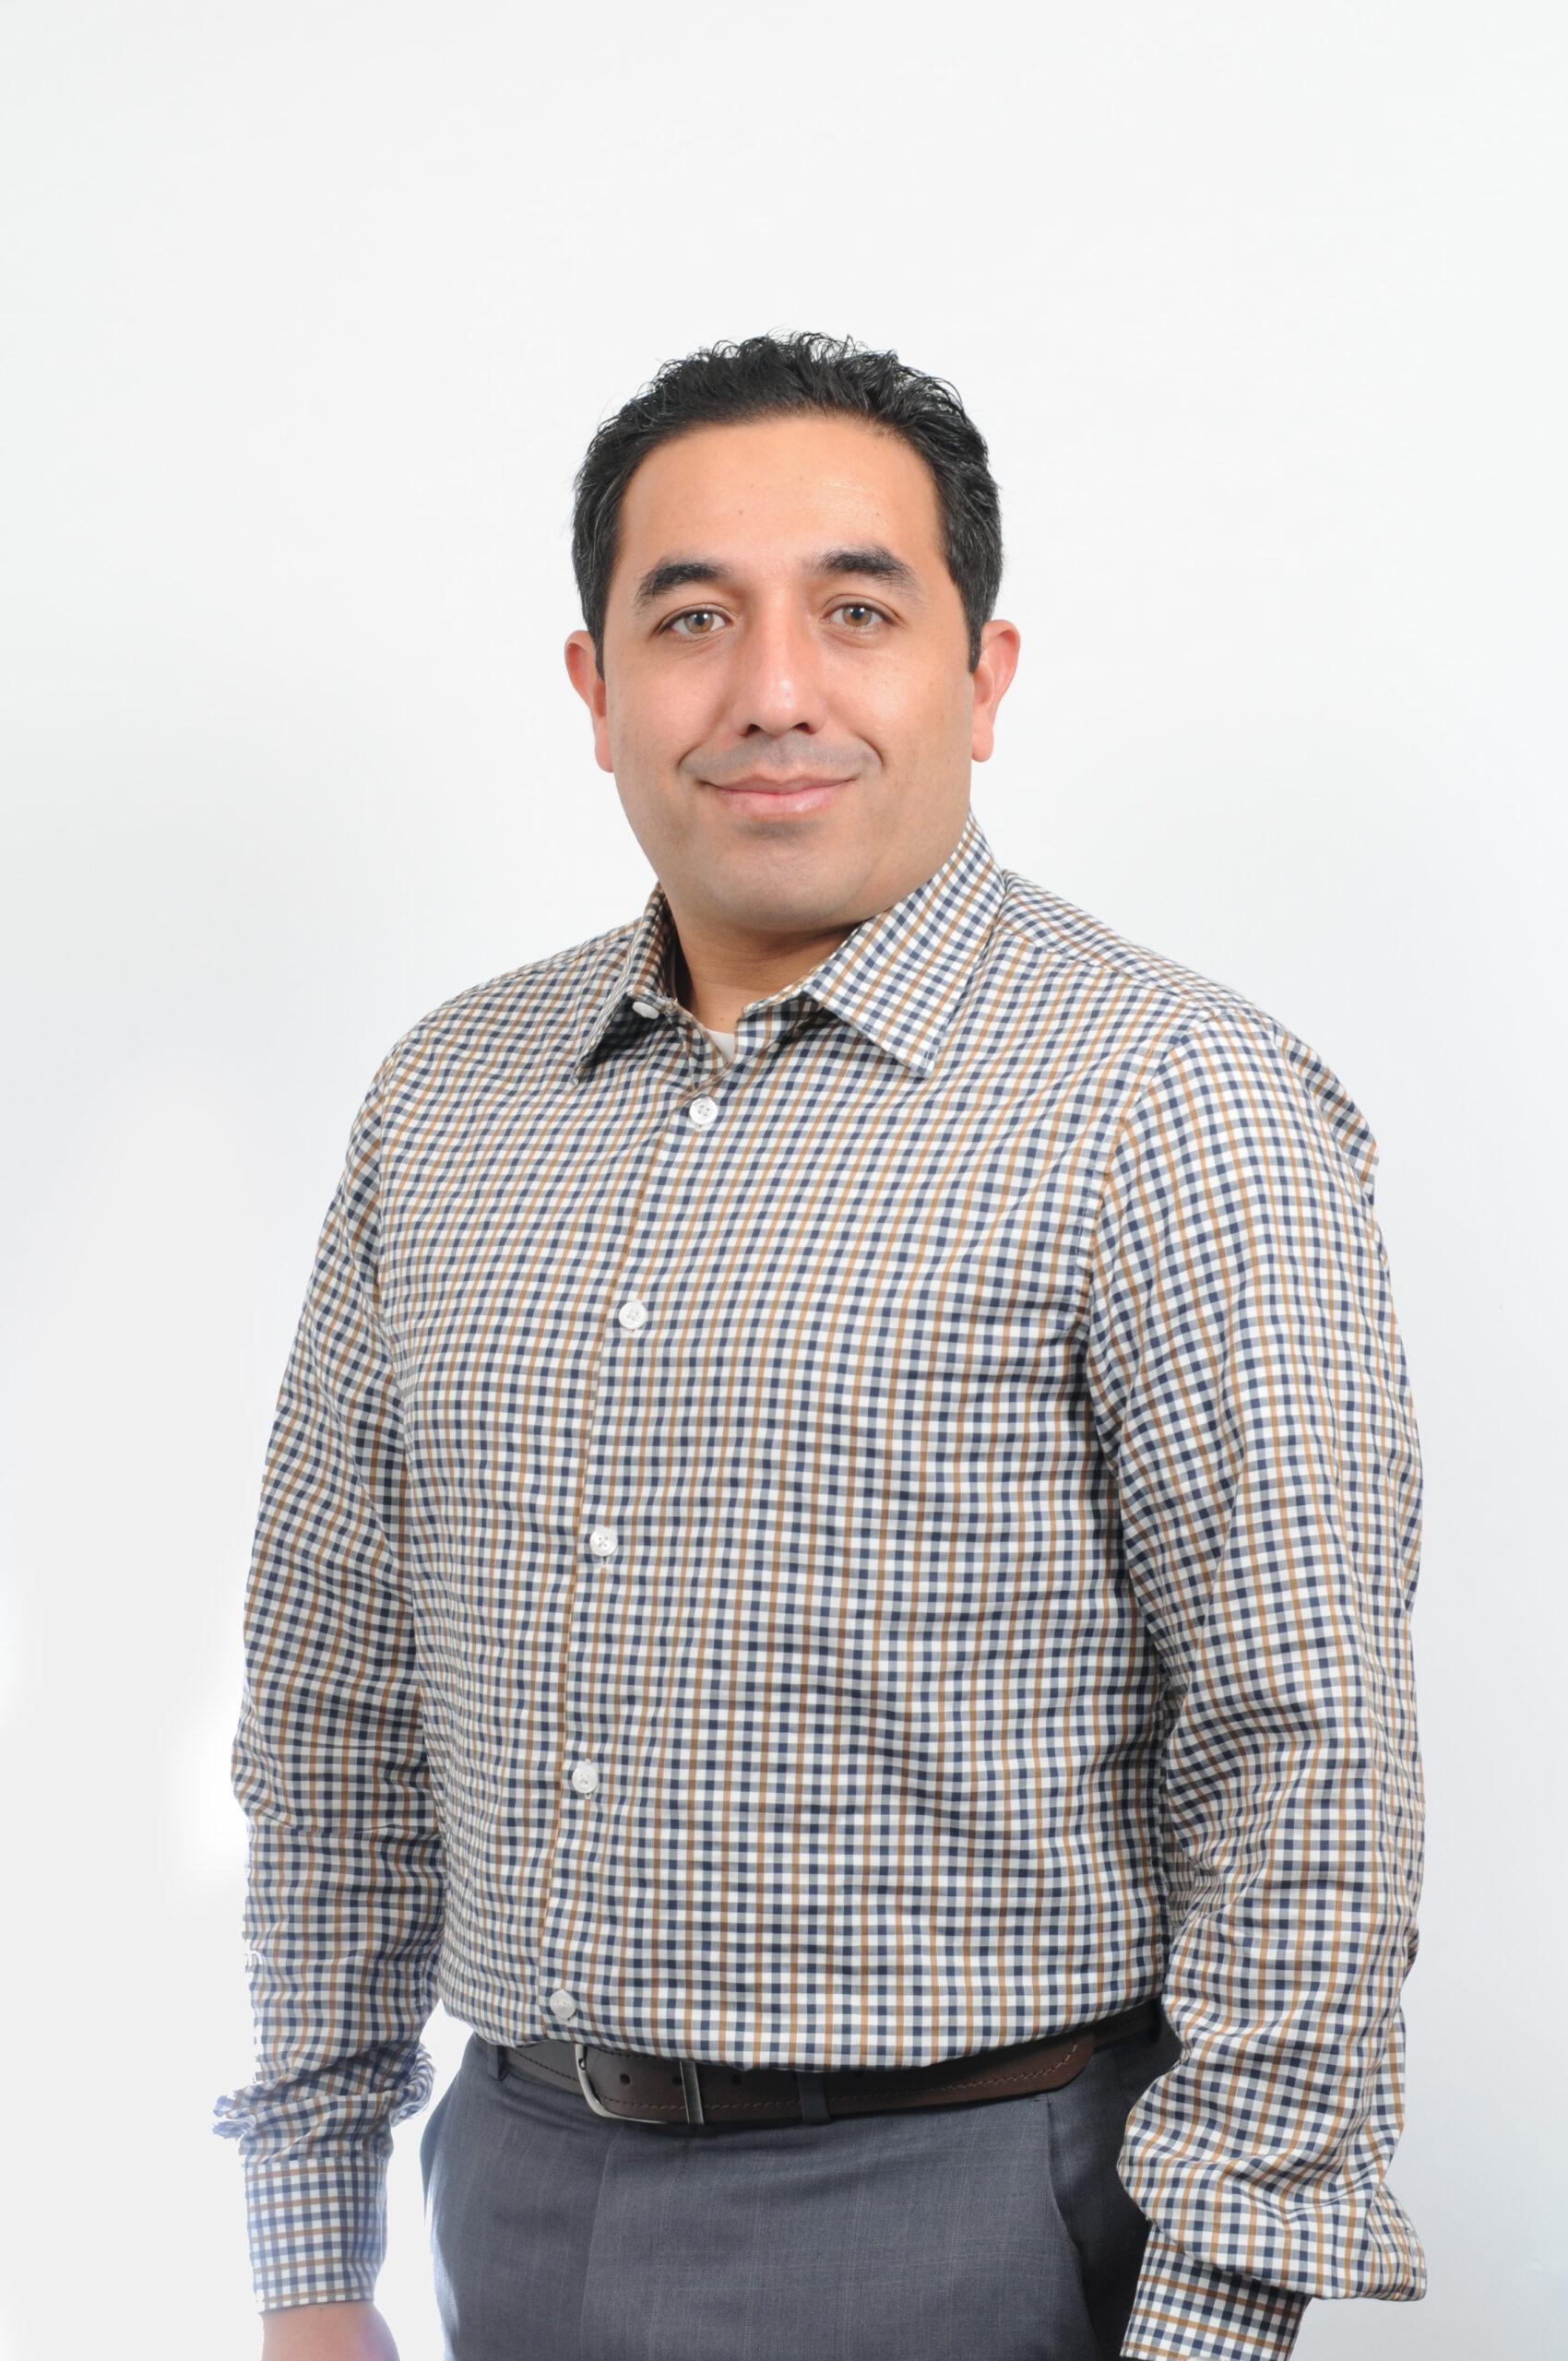 Andres Zabala-Mejía